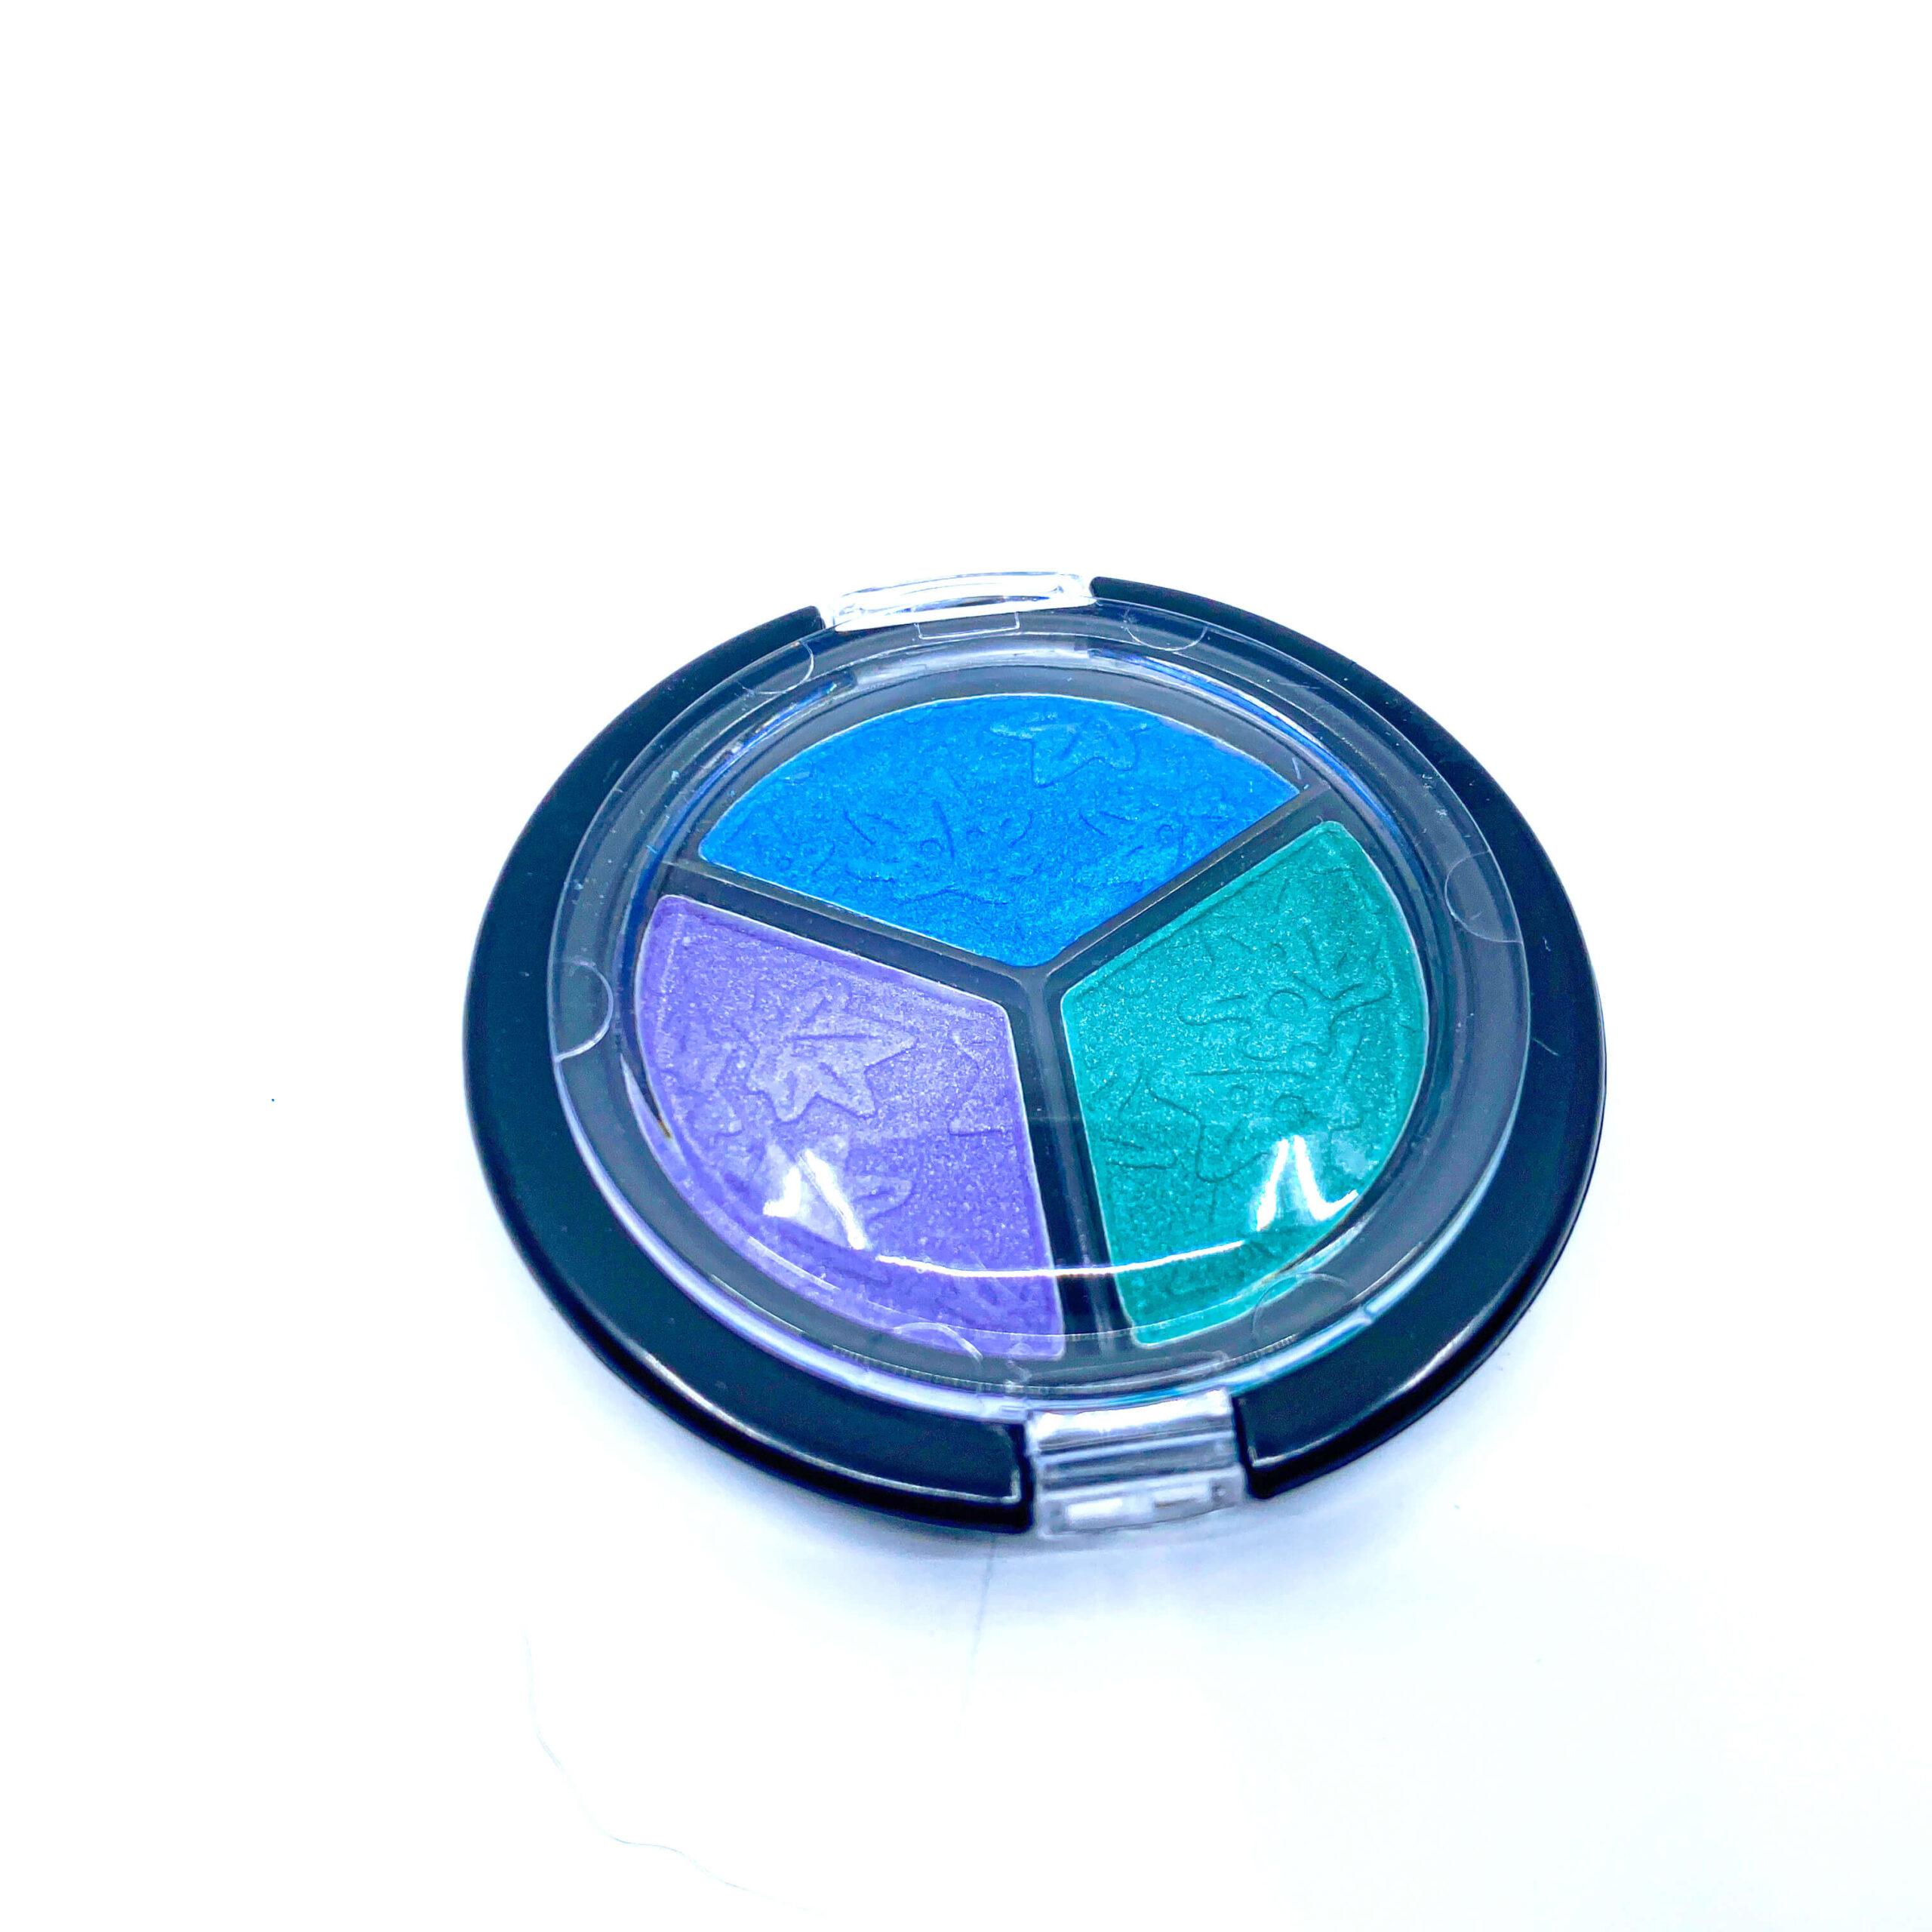 Niutoys-Juguete-maquillaje-sirena-7